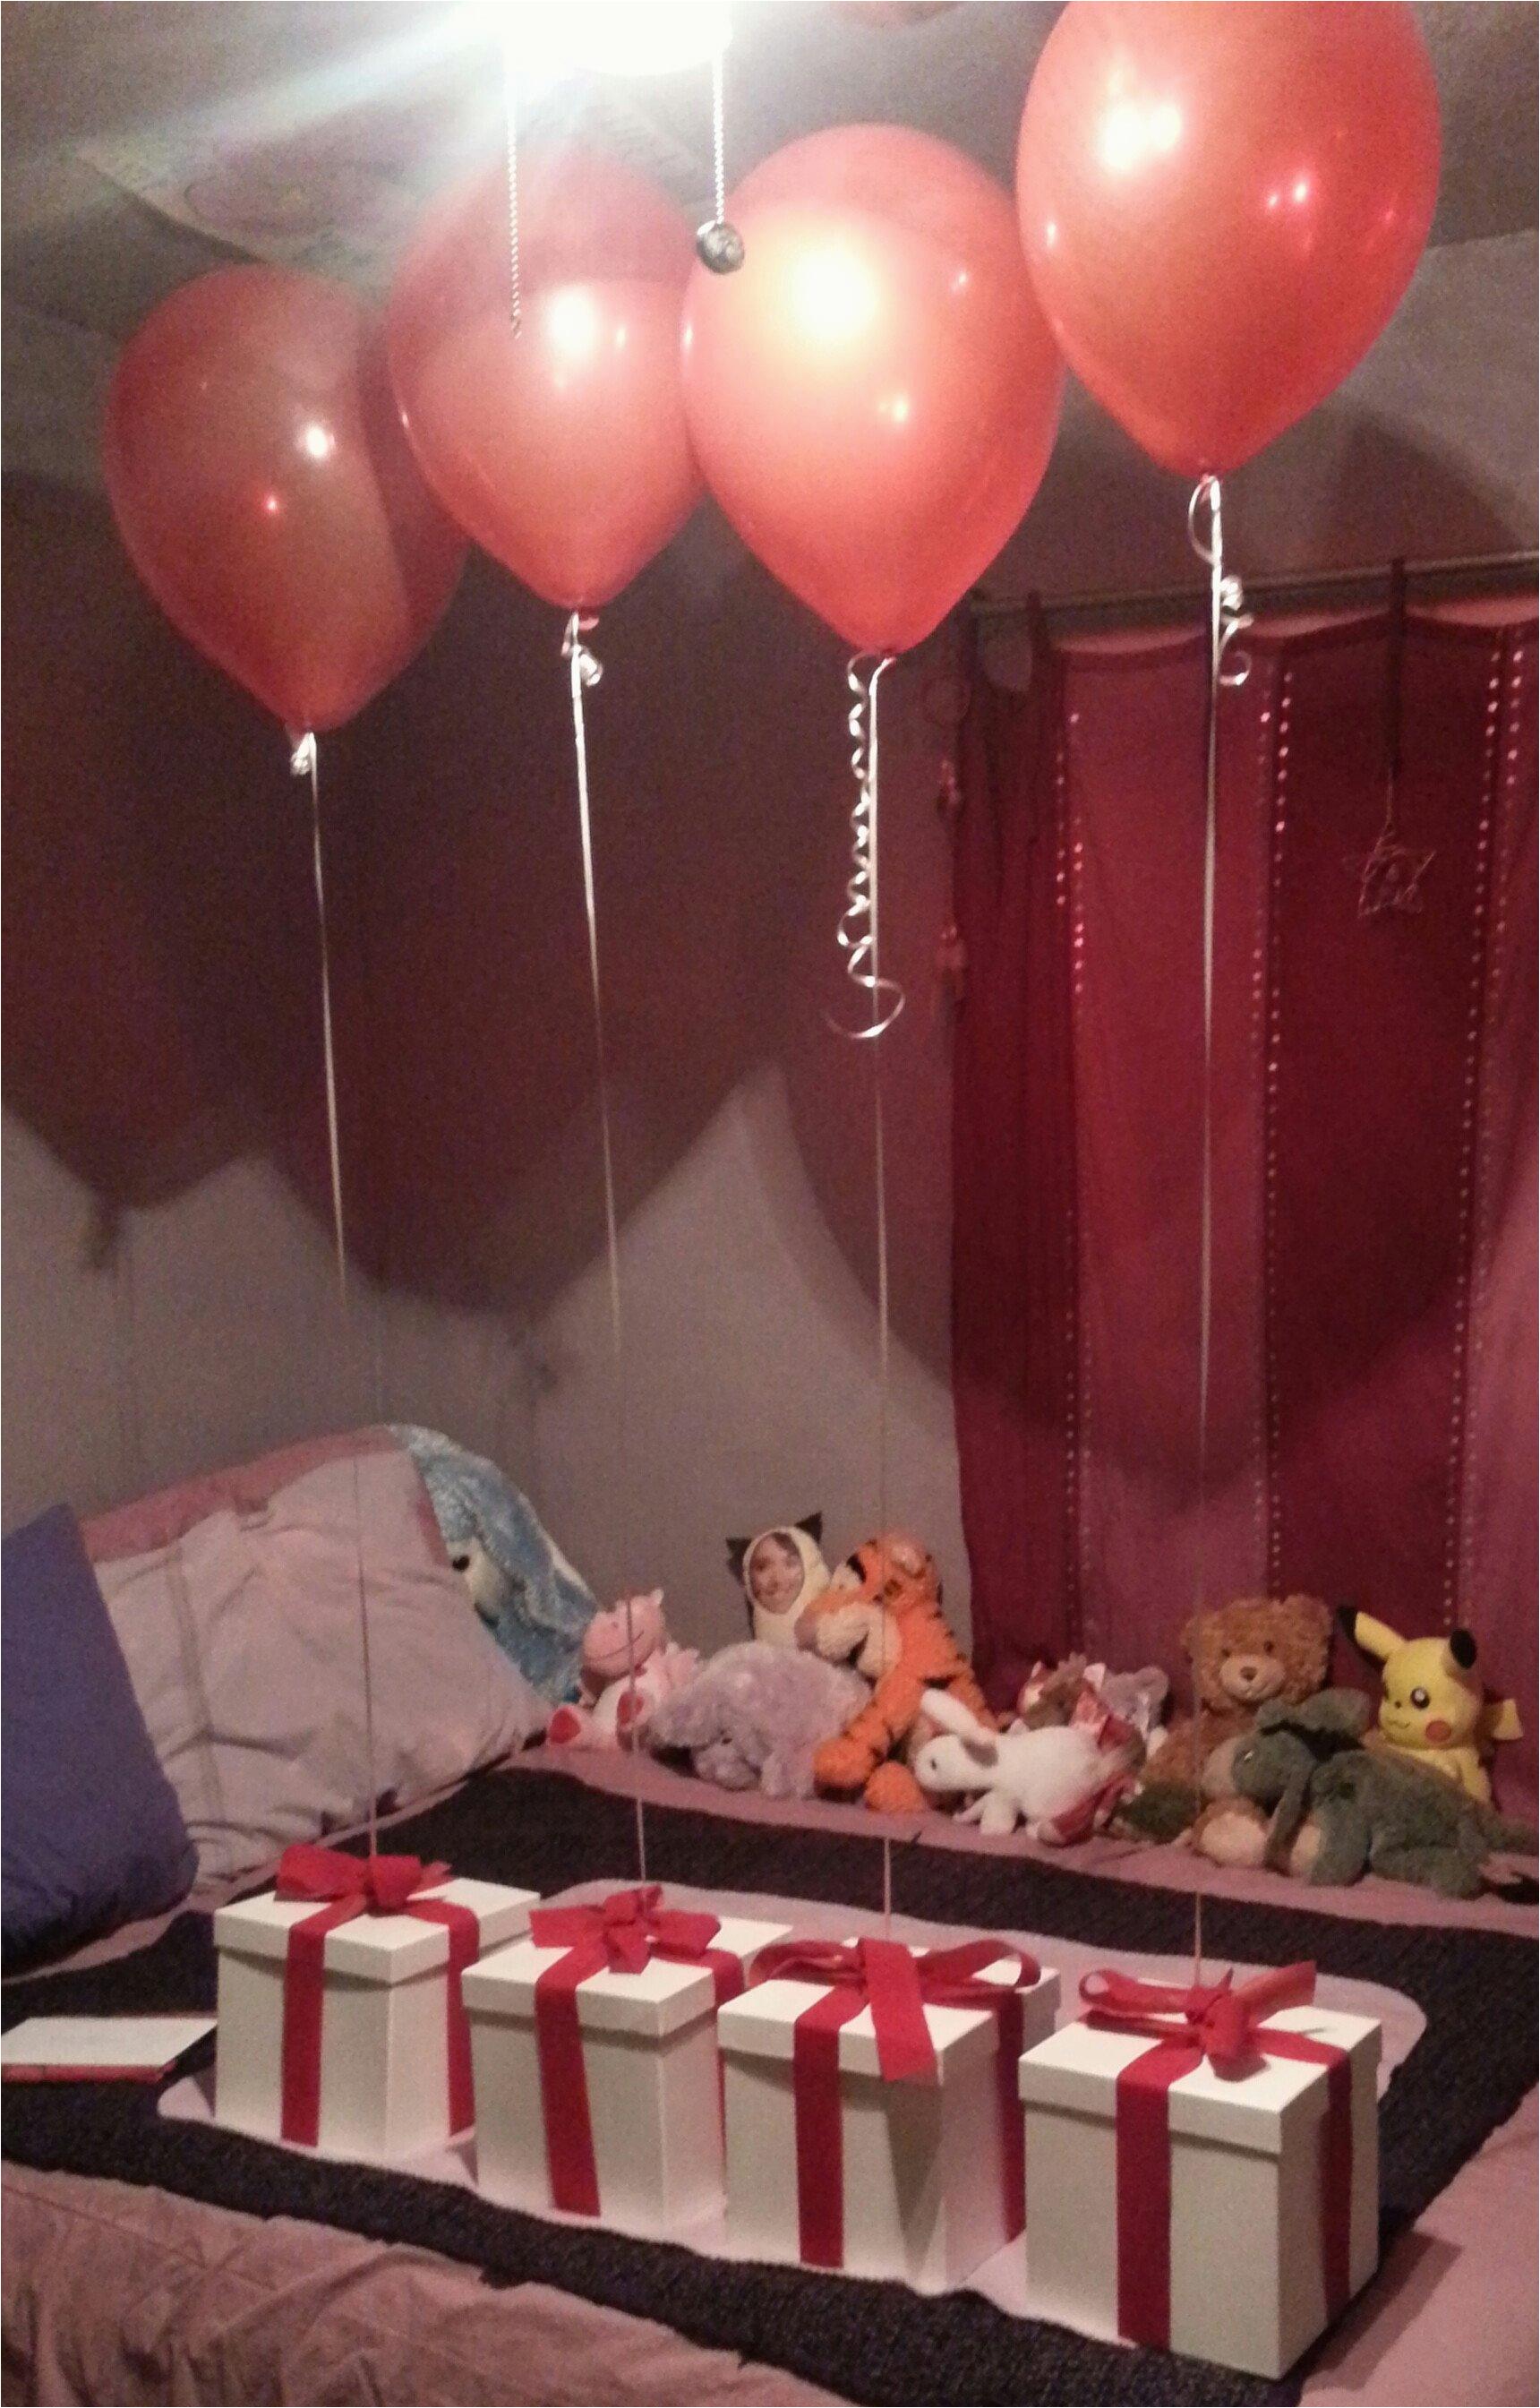 10 lovable romantic birthday gift ideas boyfriend